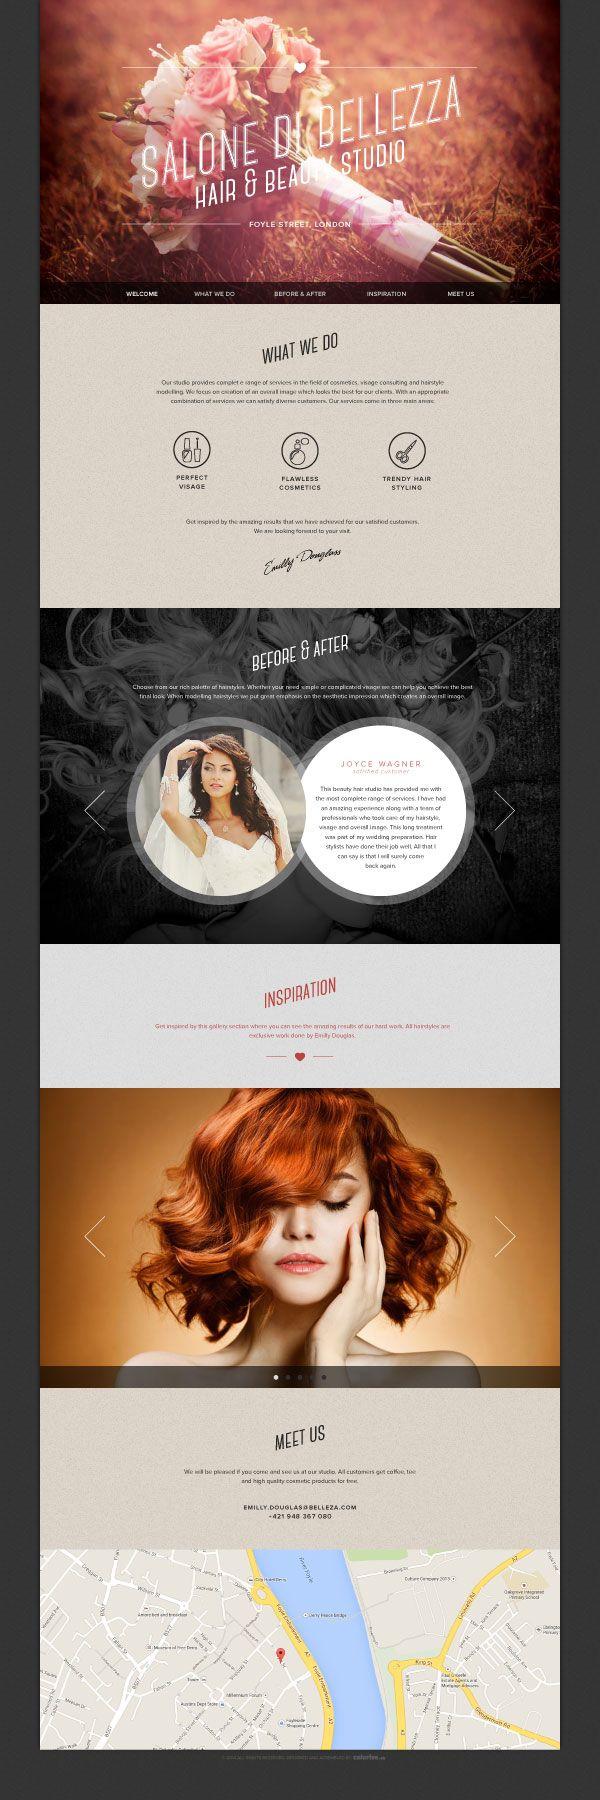 Best 25+ Salon website ideas on Pinterest   Website design cost ...